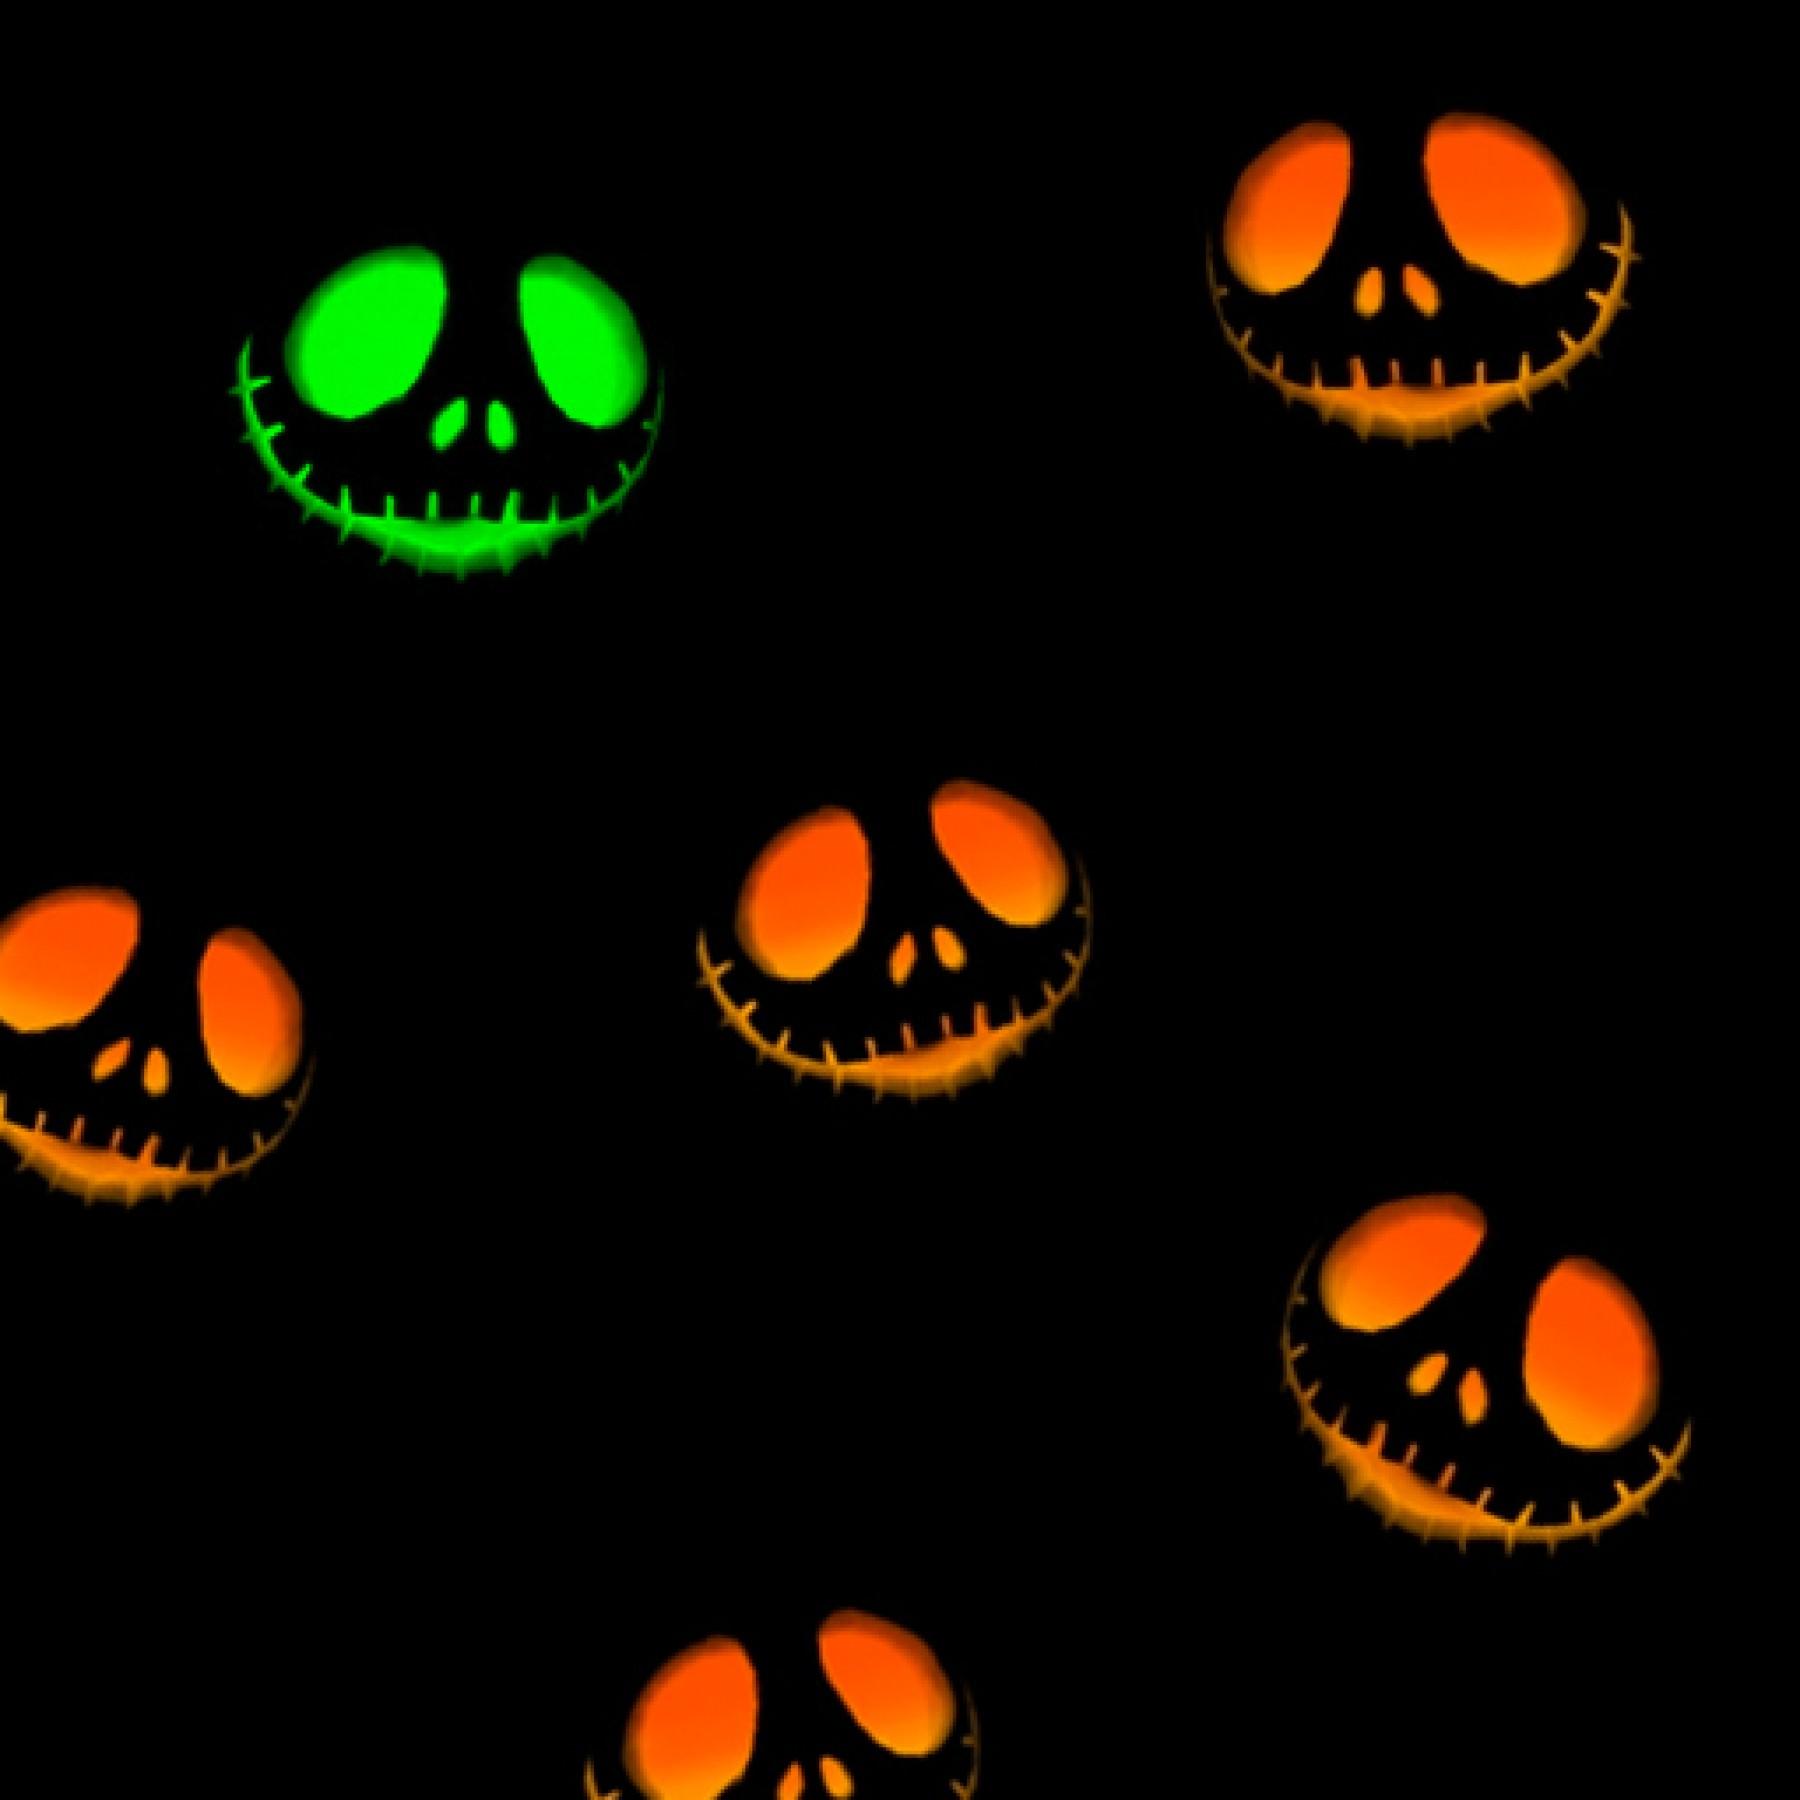 spooky-pumpkins-sensory-playtime-kids-adults-festive-mysterious-main-location